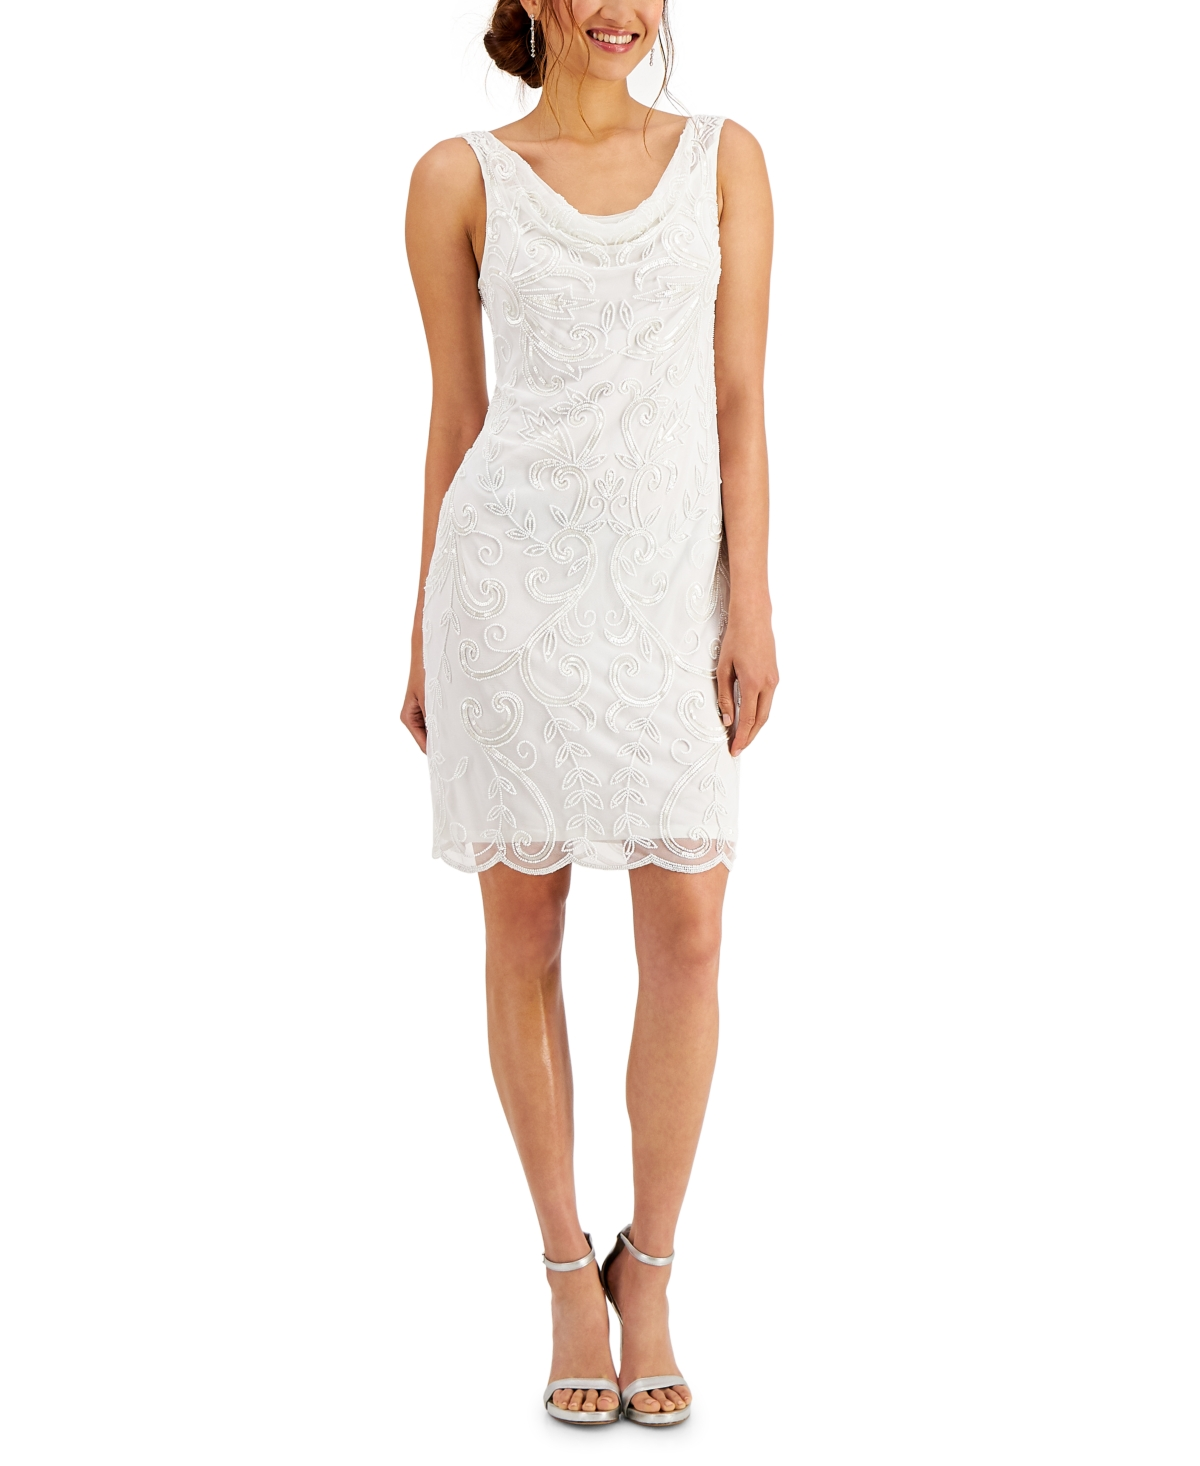 J Kara Chiffon Cowlneck Dress